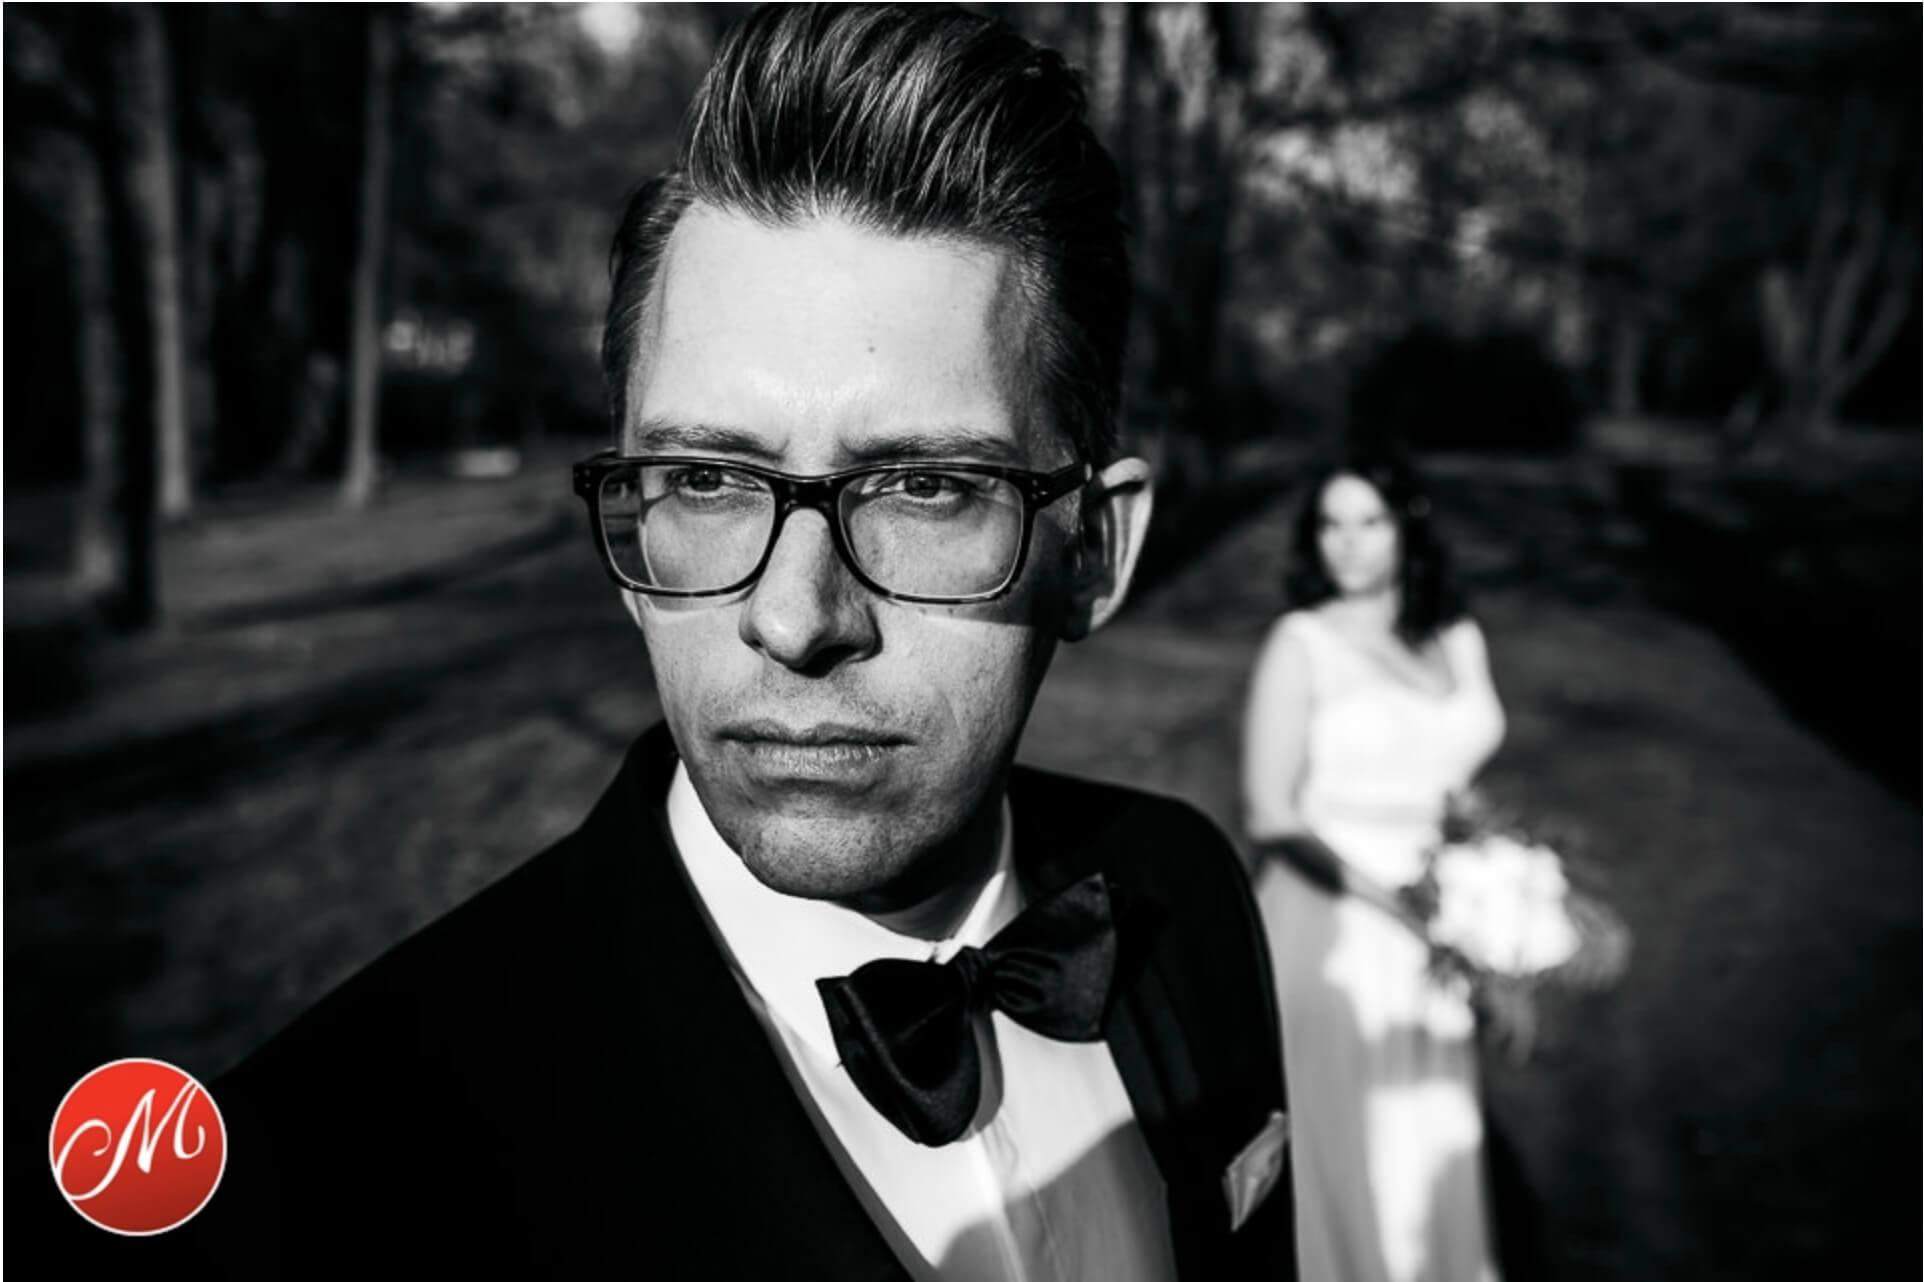 Hochzeitsfotograf Award Winner